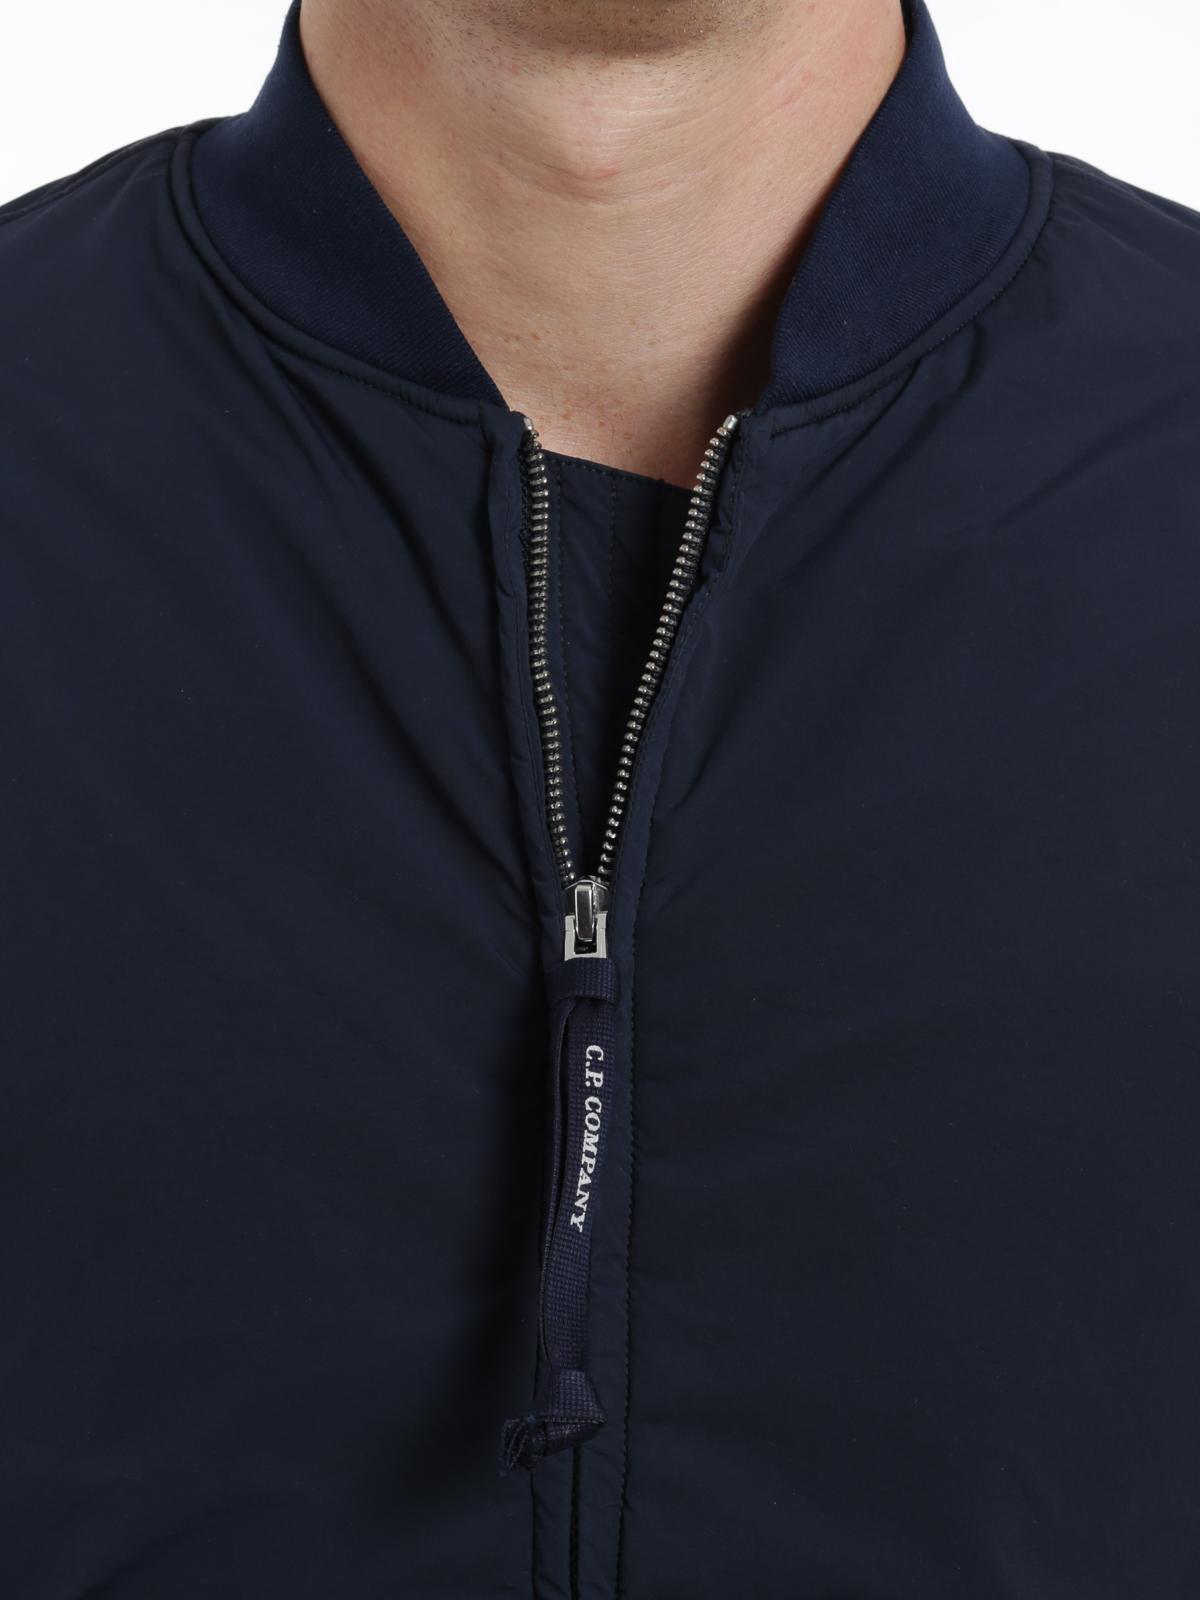 CP Company - Giubbotto foderato - giacche casual - 15WCPUC01329001020888 0afe3786c291